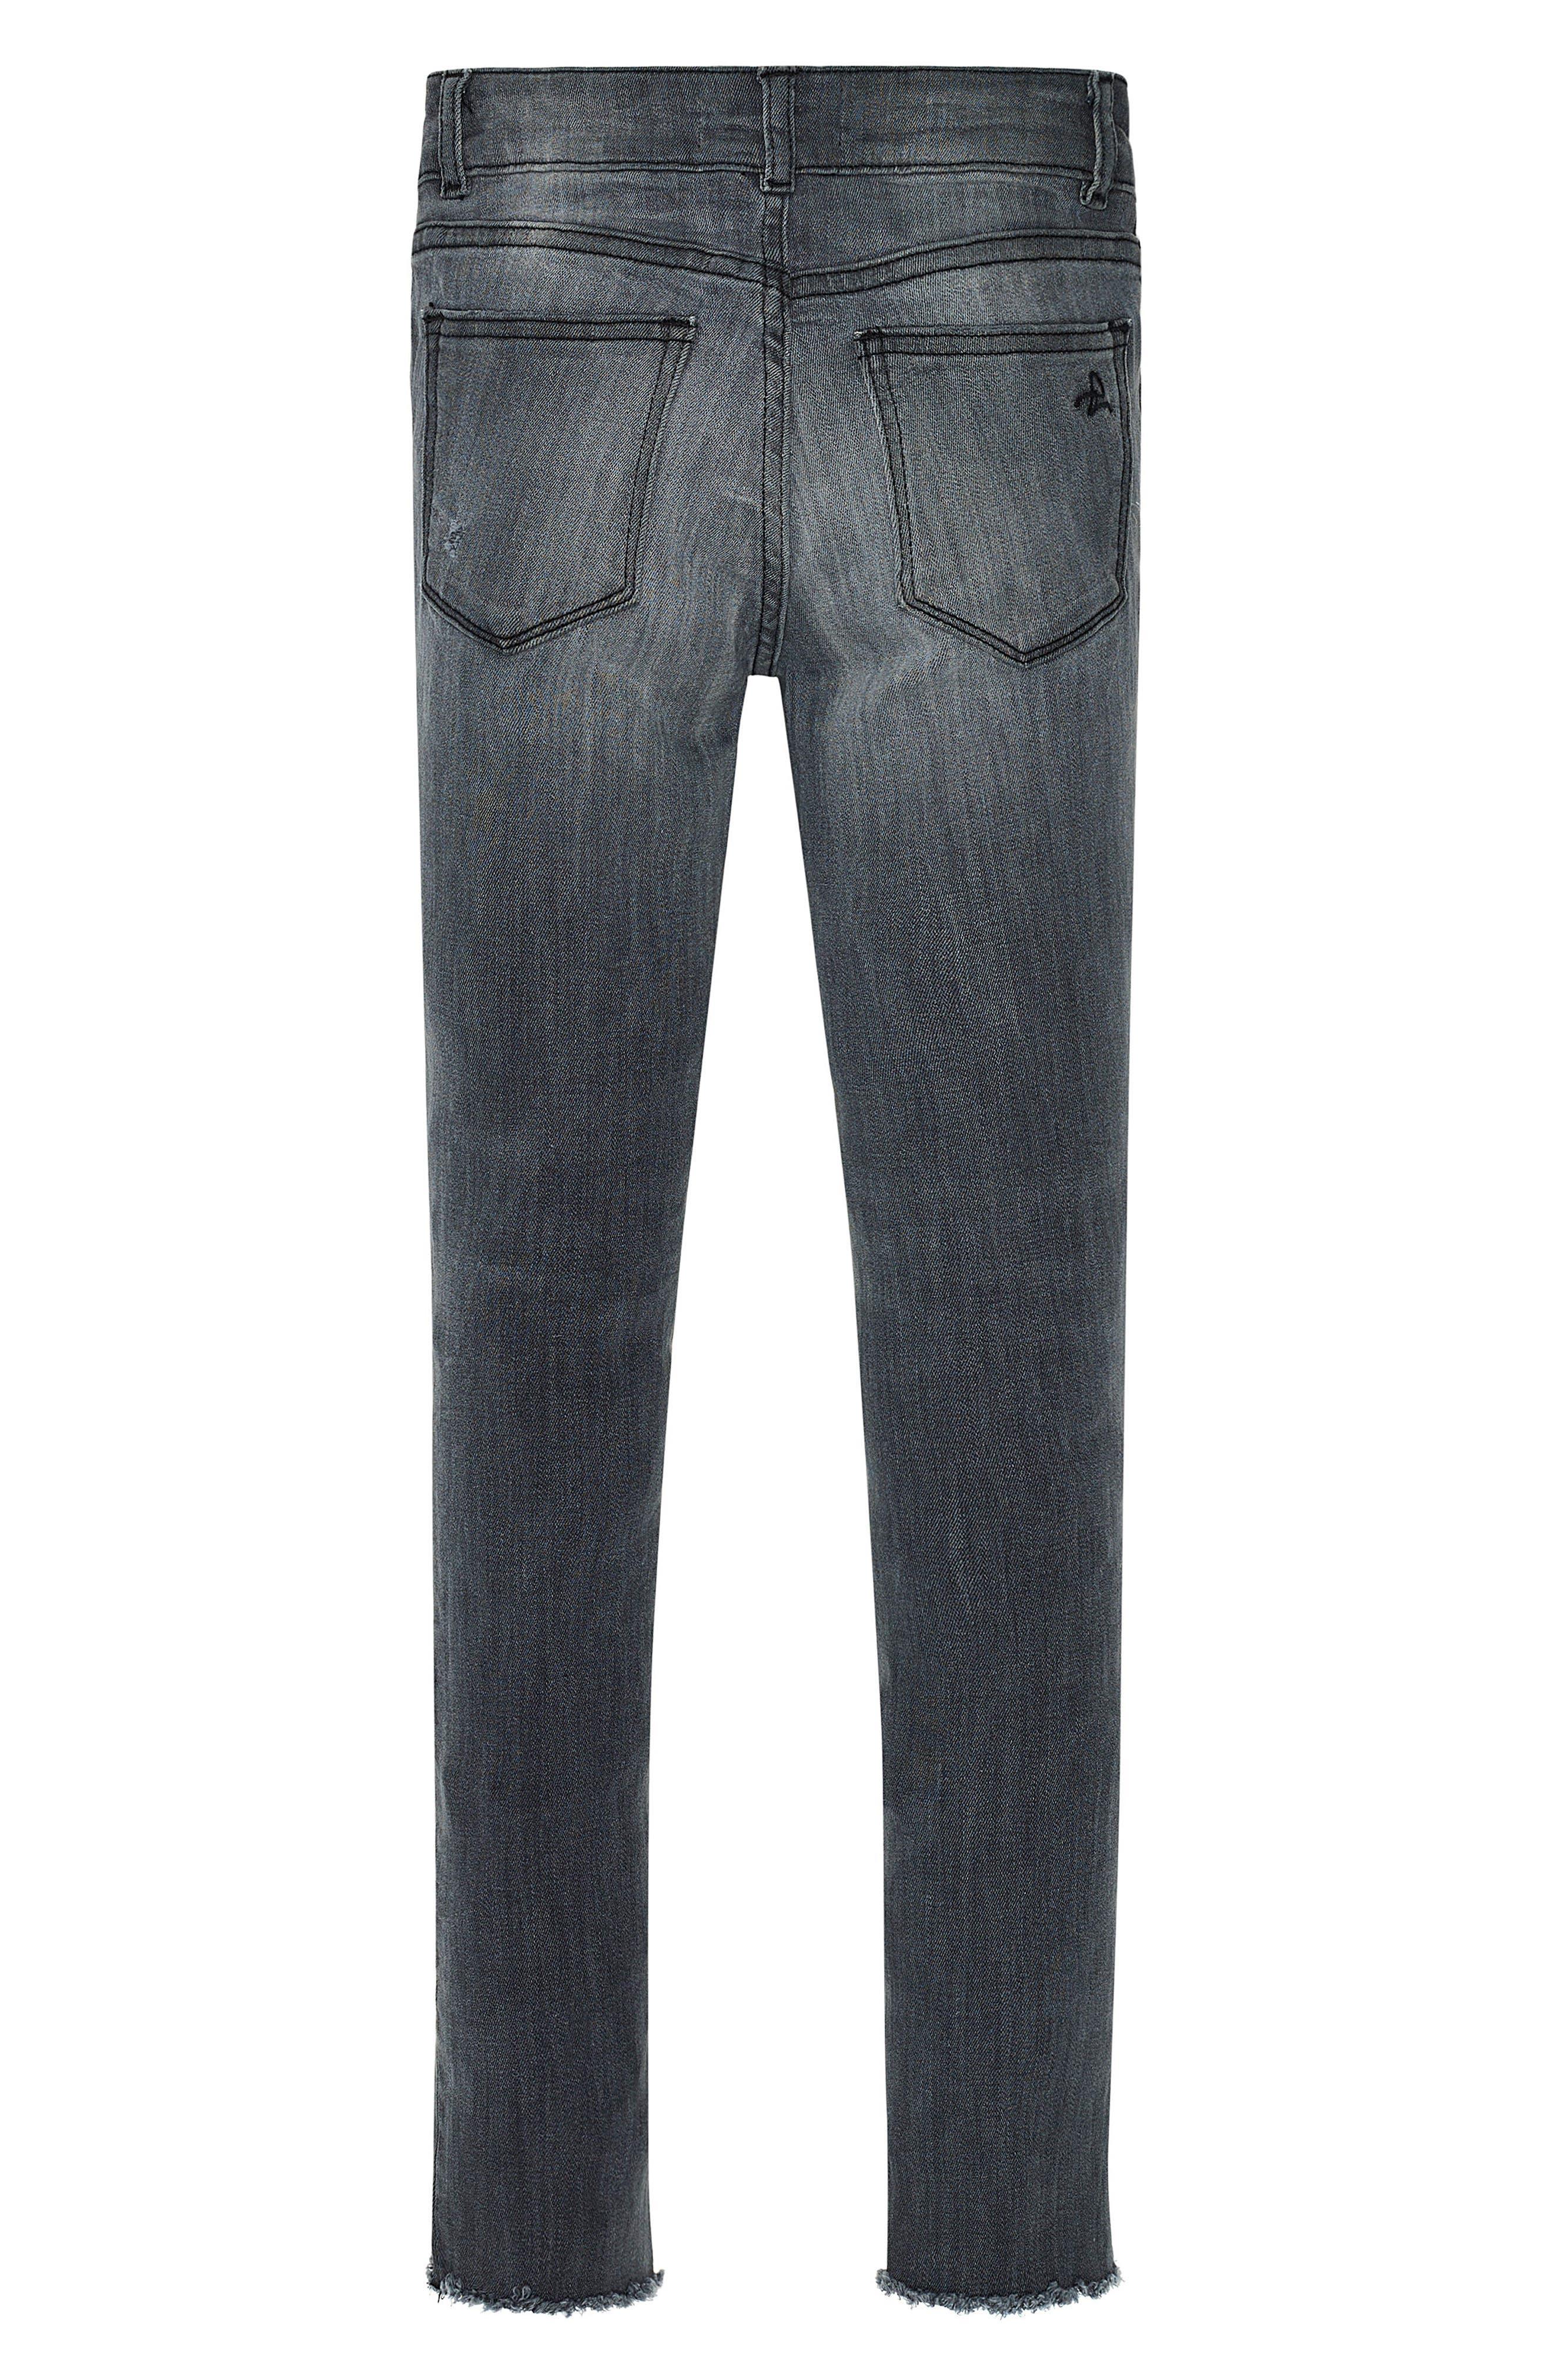 Alternate Image 2  - DL1961 Chloe Raw Hem Skinny Jeans (Big Girls)